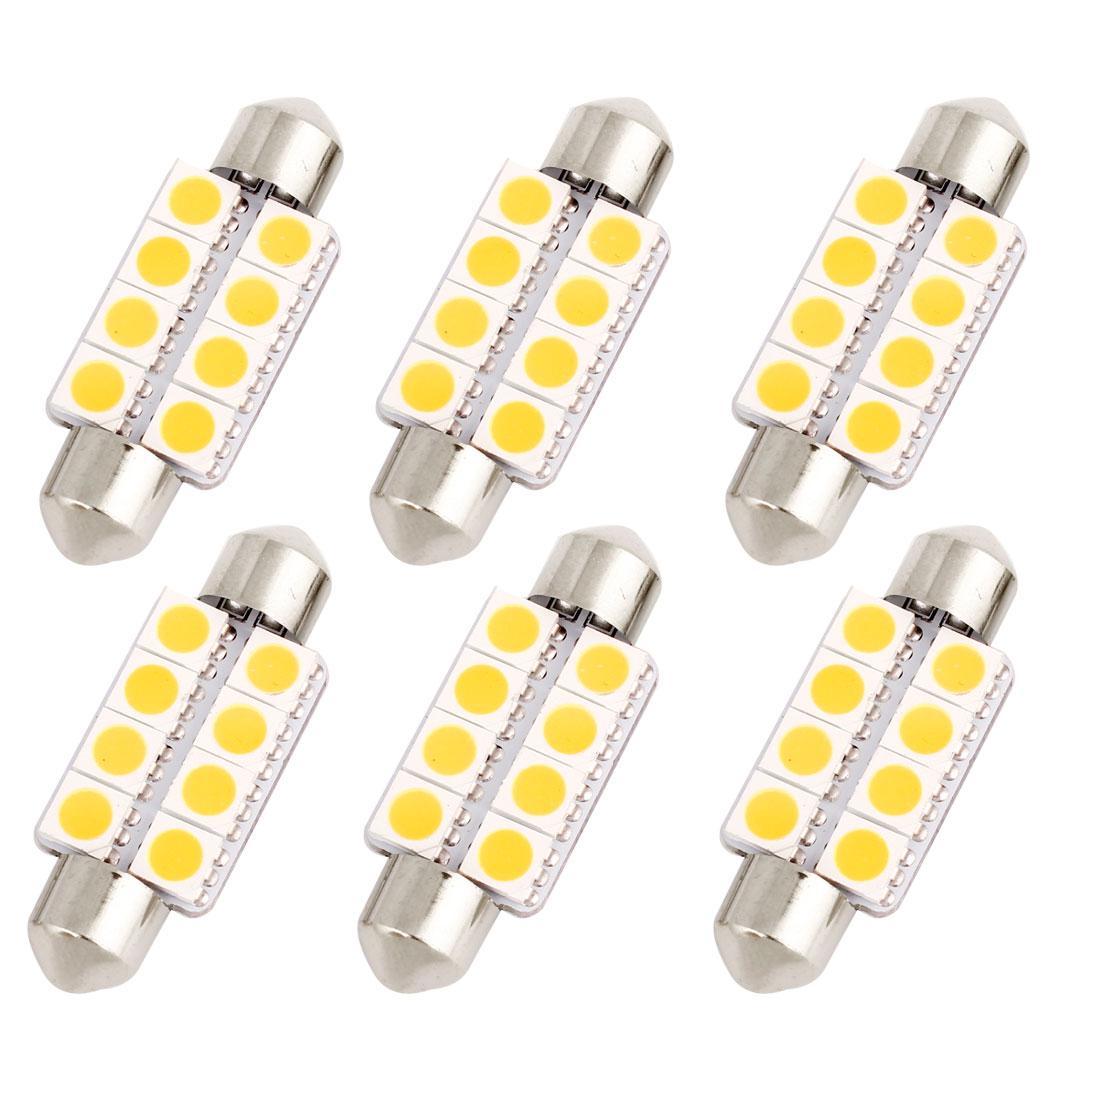 "6 Pcs 39mm 1.54"" 5050 SMD 8-LED Warm White Festoon Dome Light Bulb DE3425 DE3423 Internal"